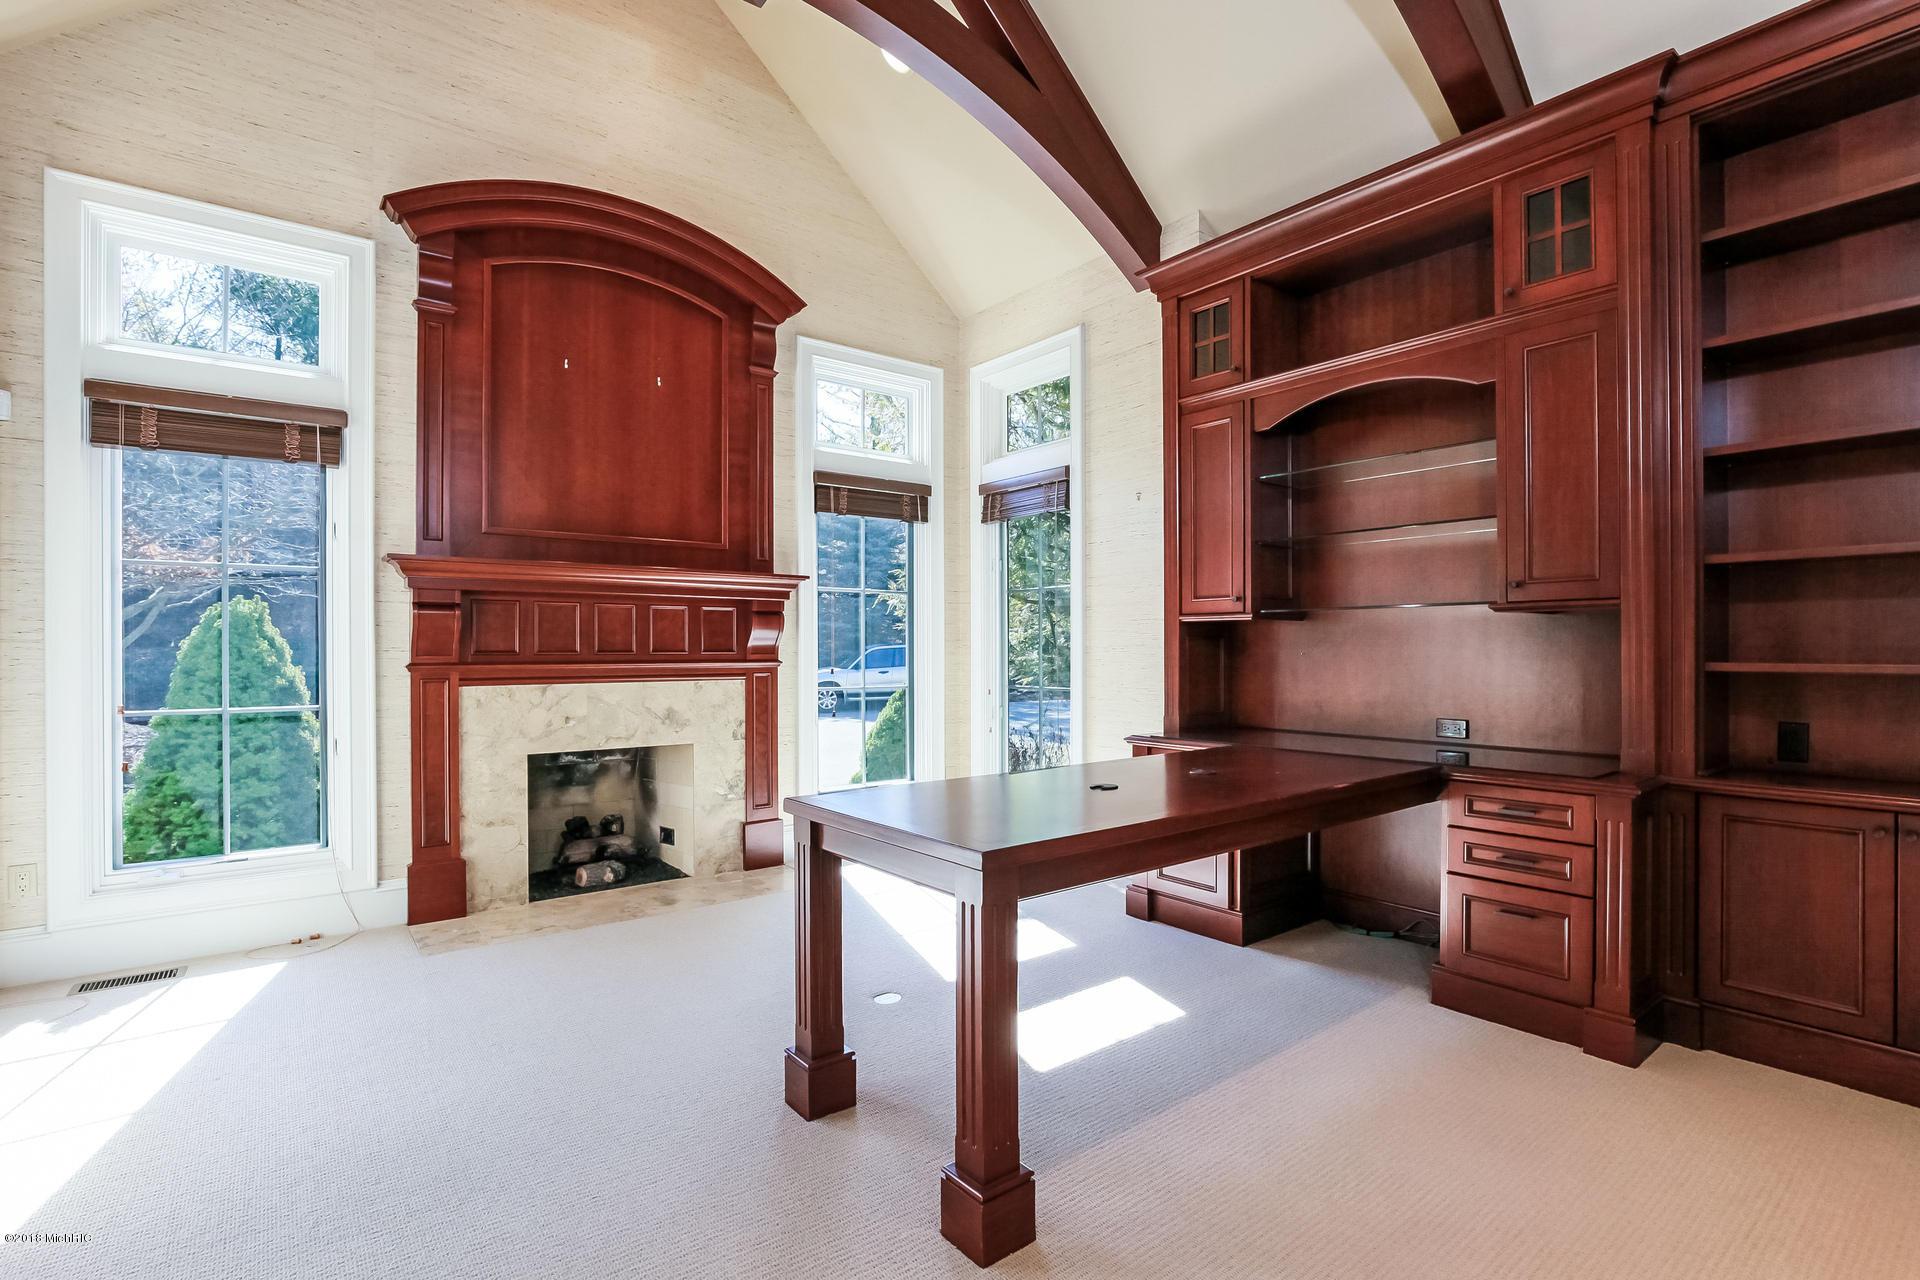 Old Fashioned Ada Cabinet Hardware Gallery - Luxurious Bathtub Ideas ...